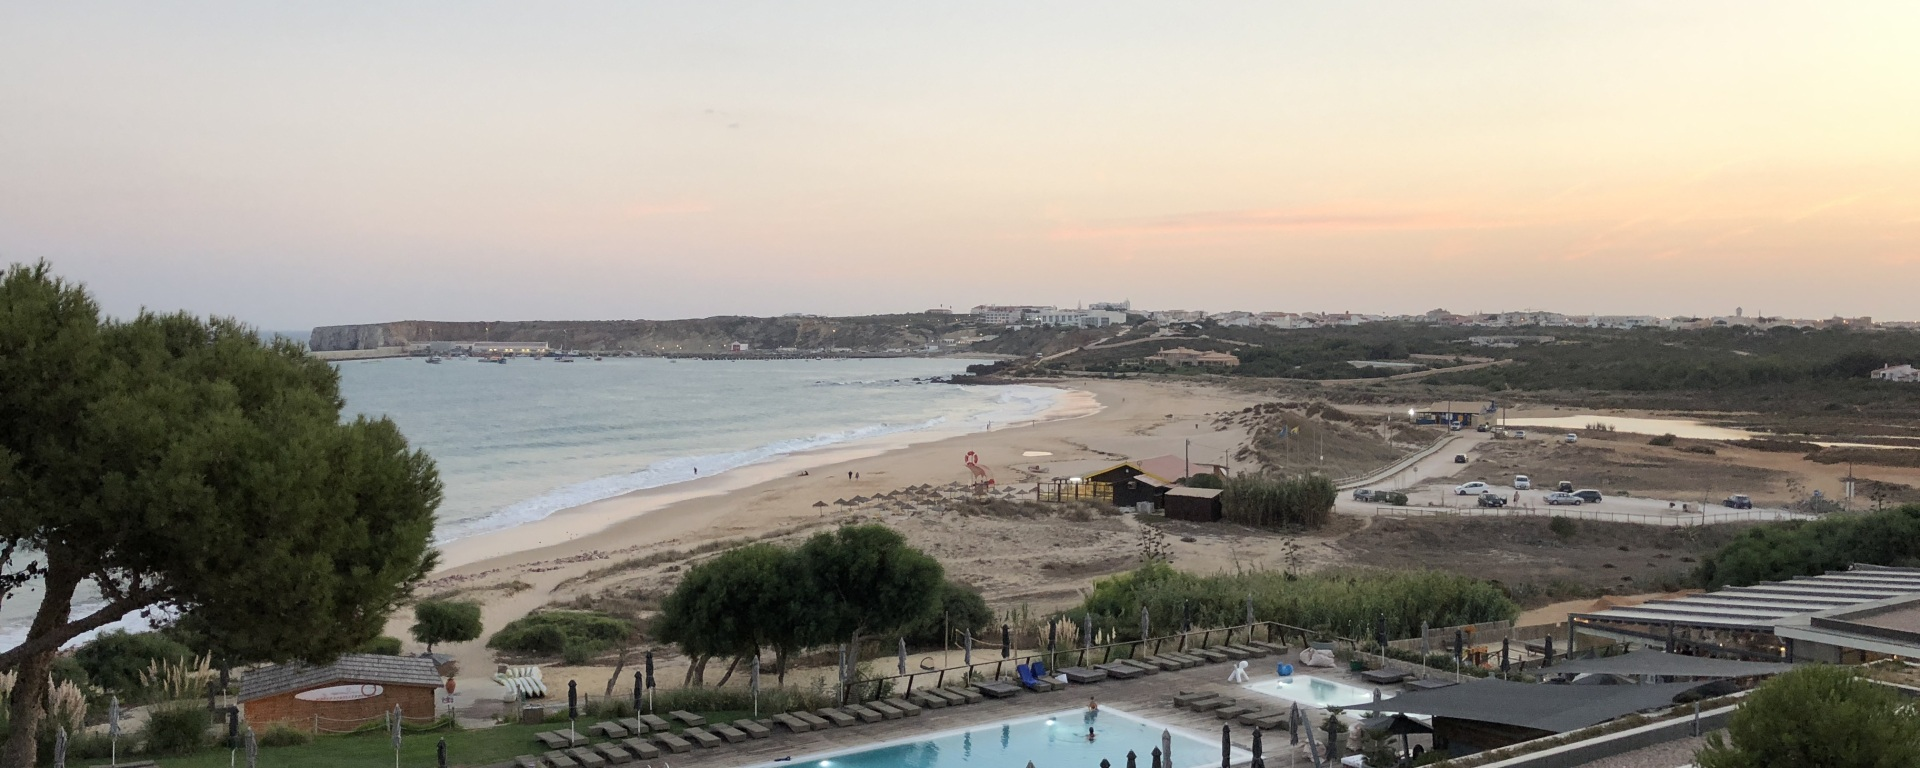 Sunset Sunday In Martinhal Sagres Beach Family Resort Portugal